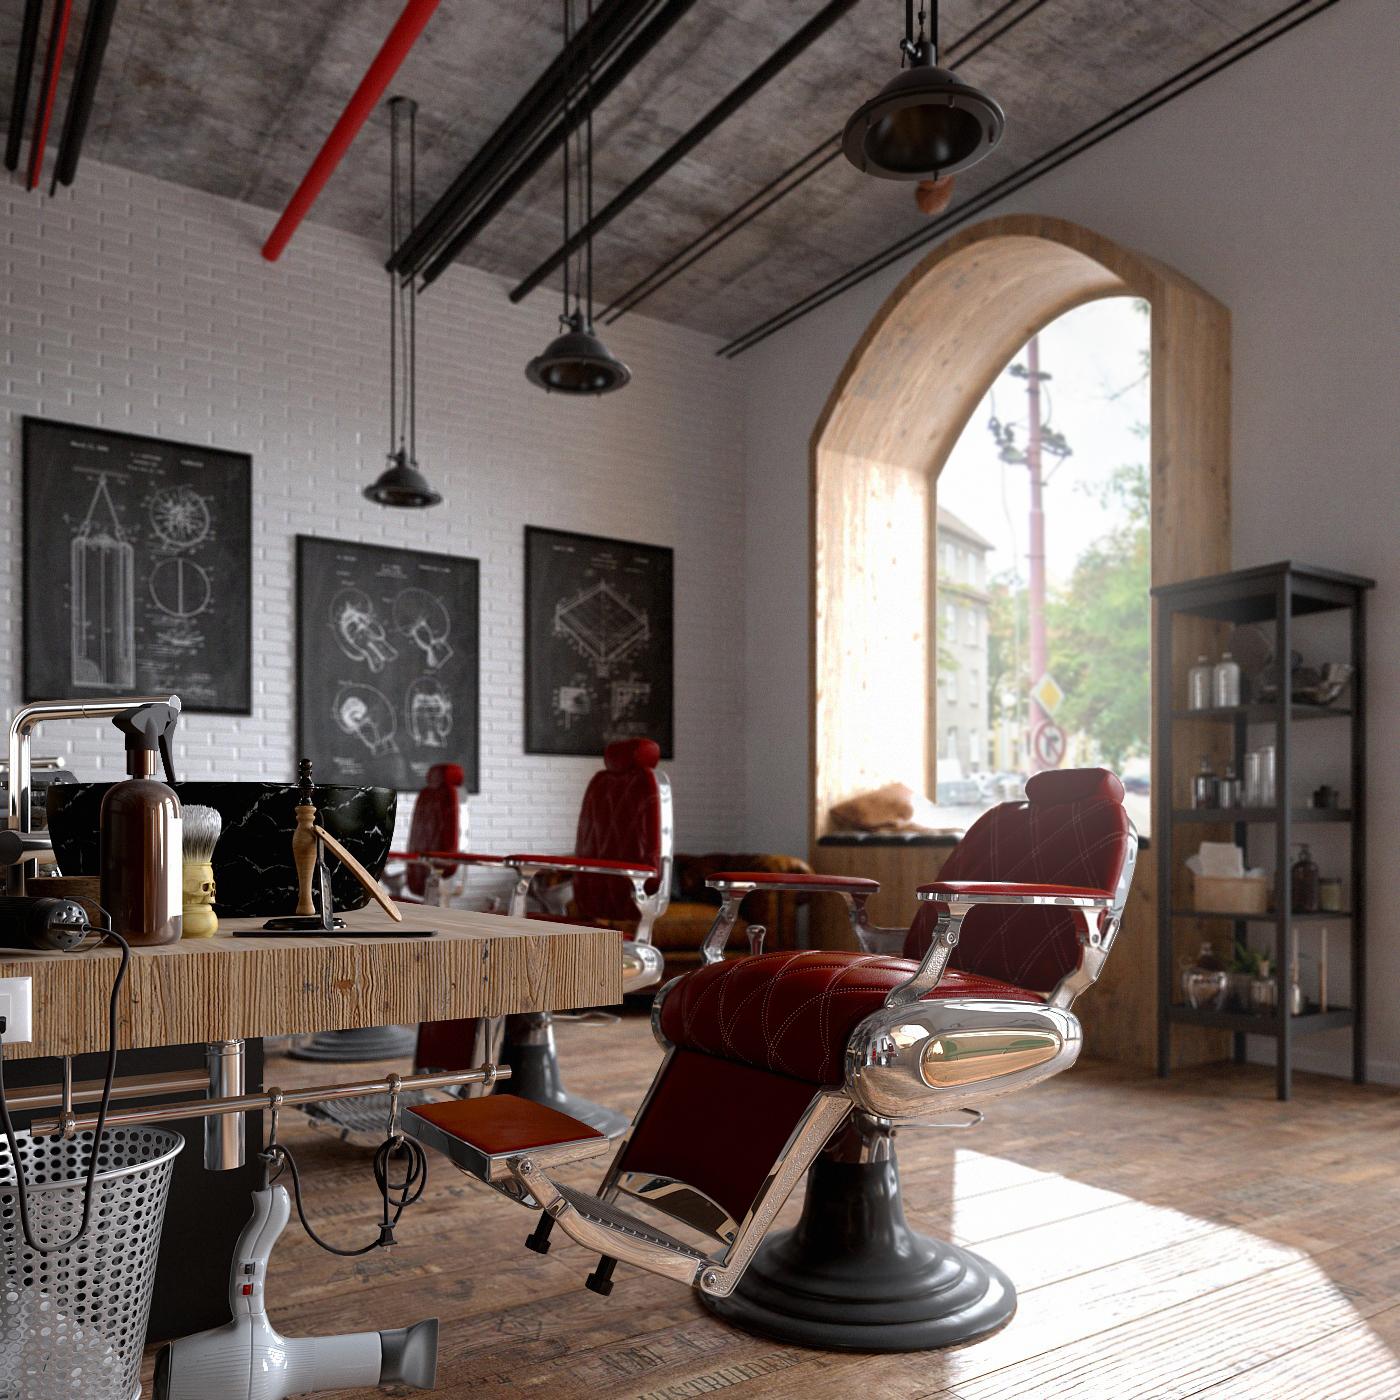 LR barbershop I